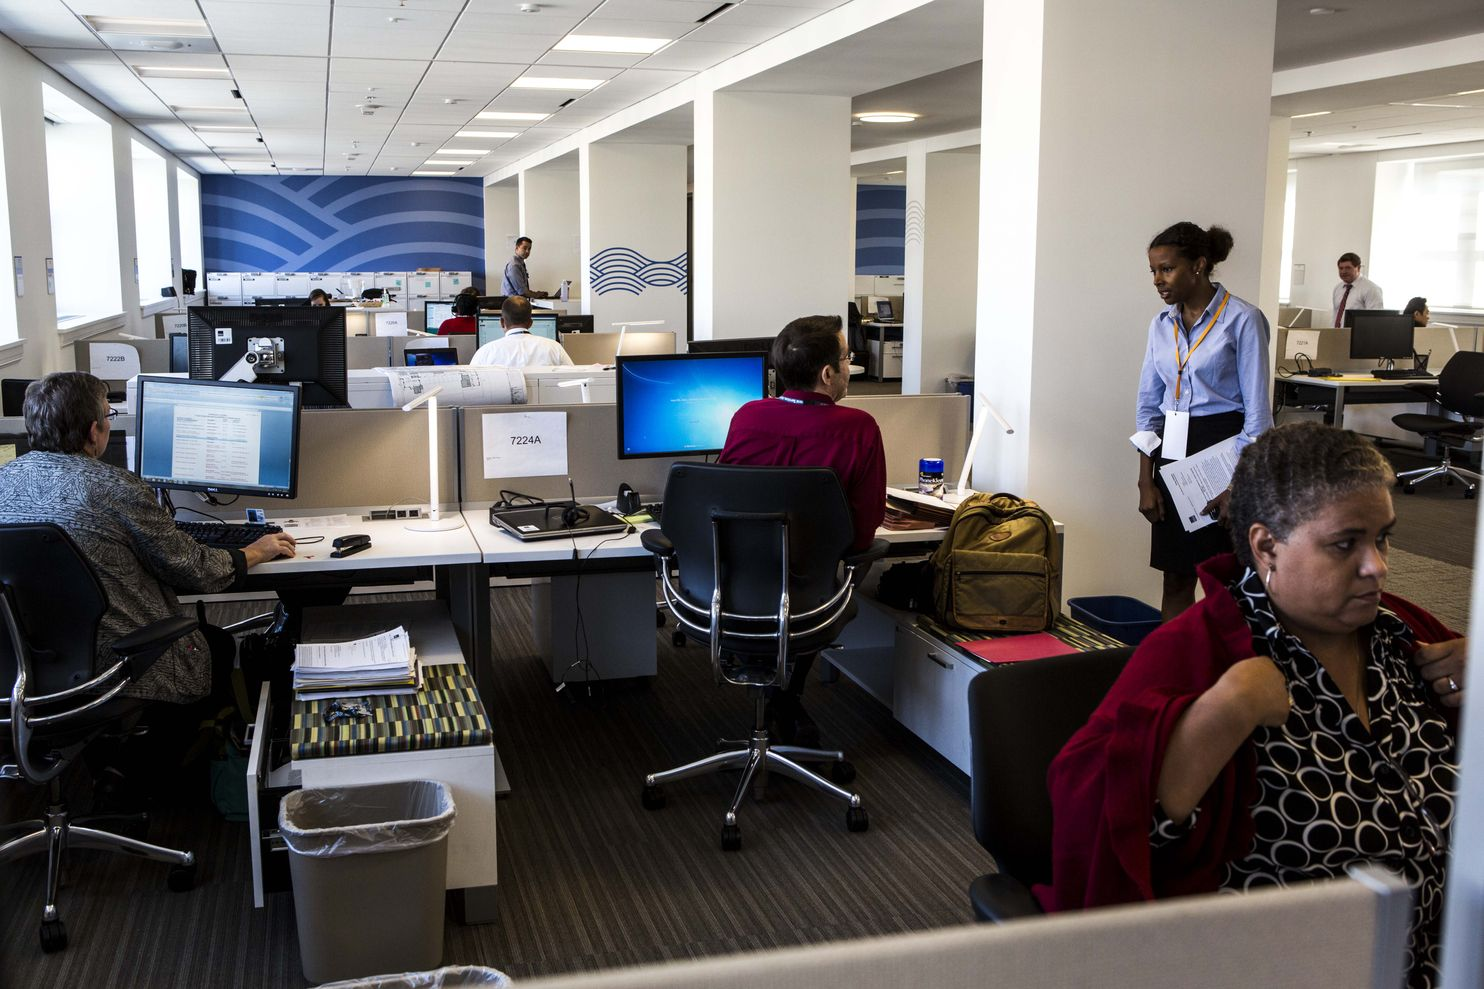 Desk Ideas Office Cubicle